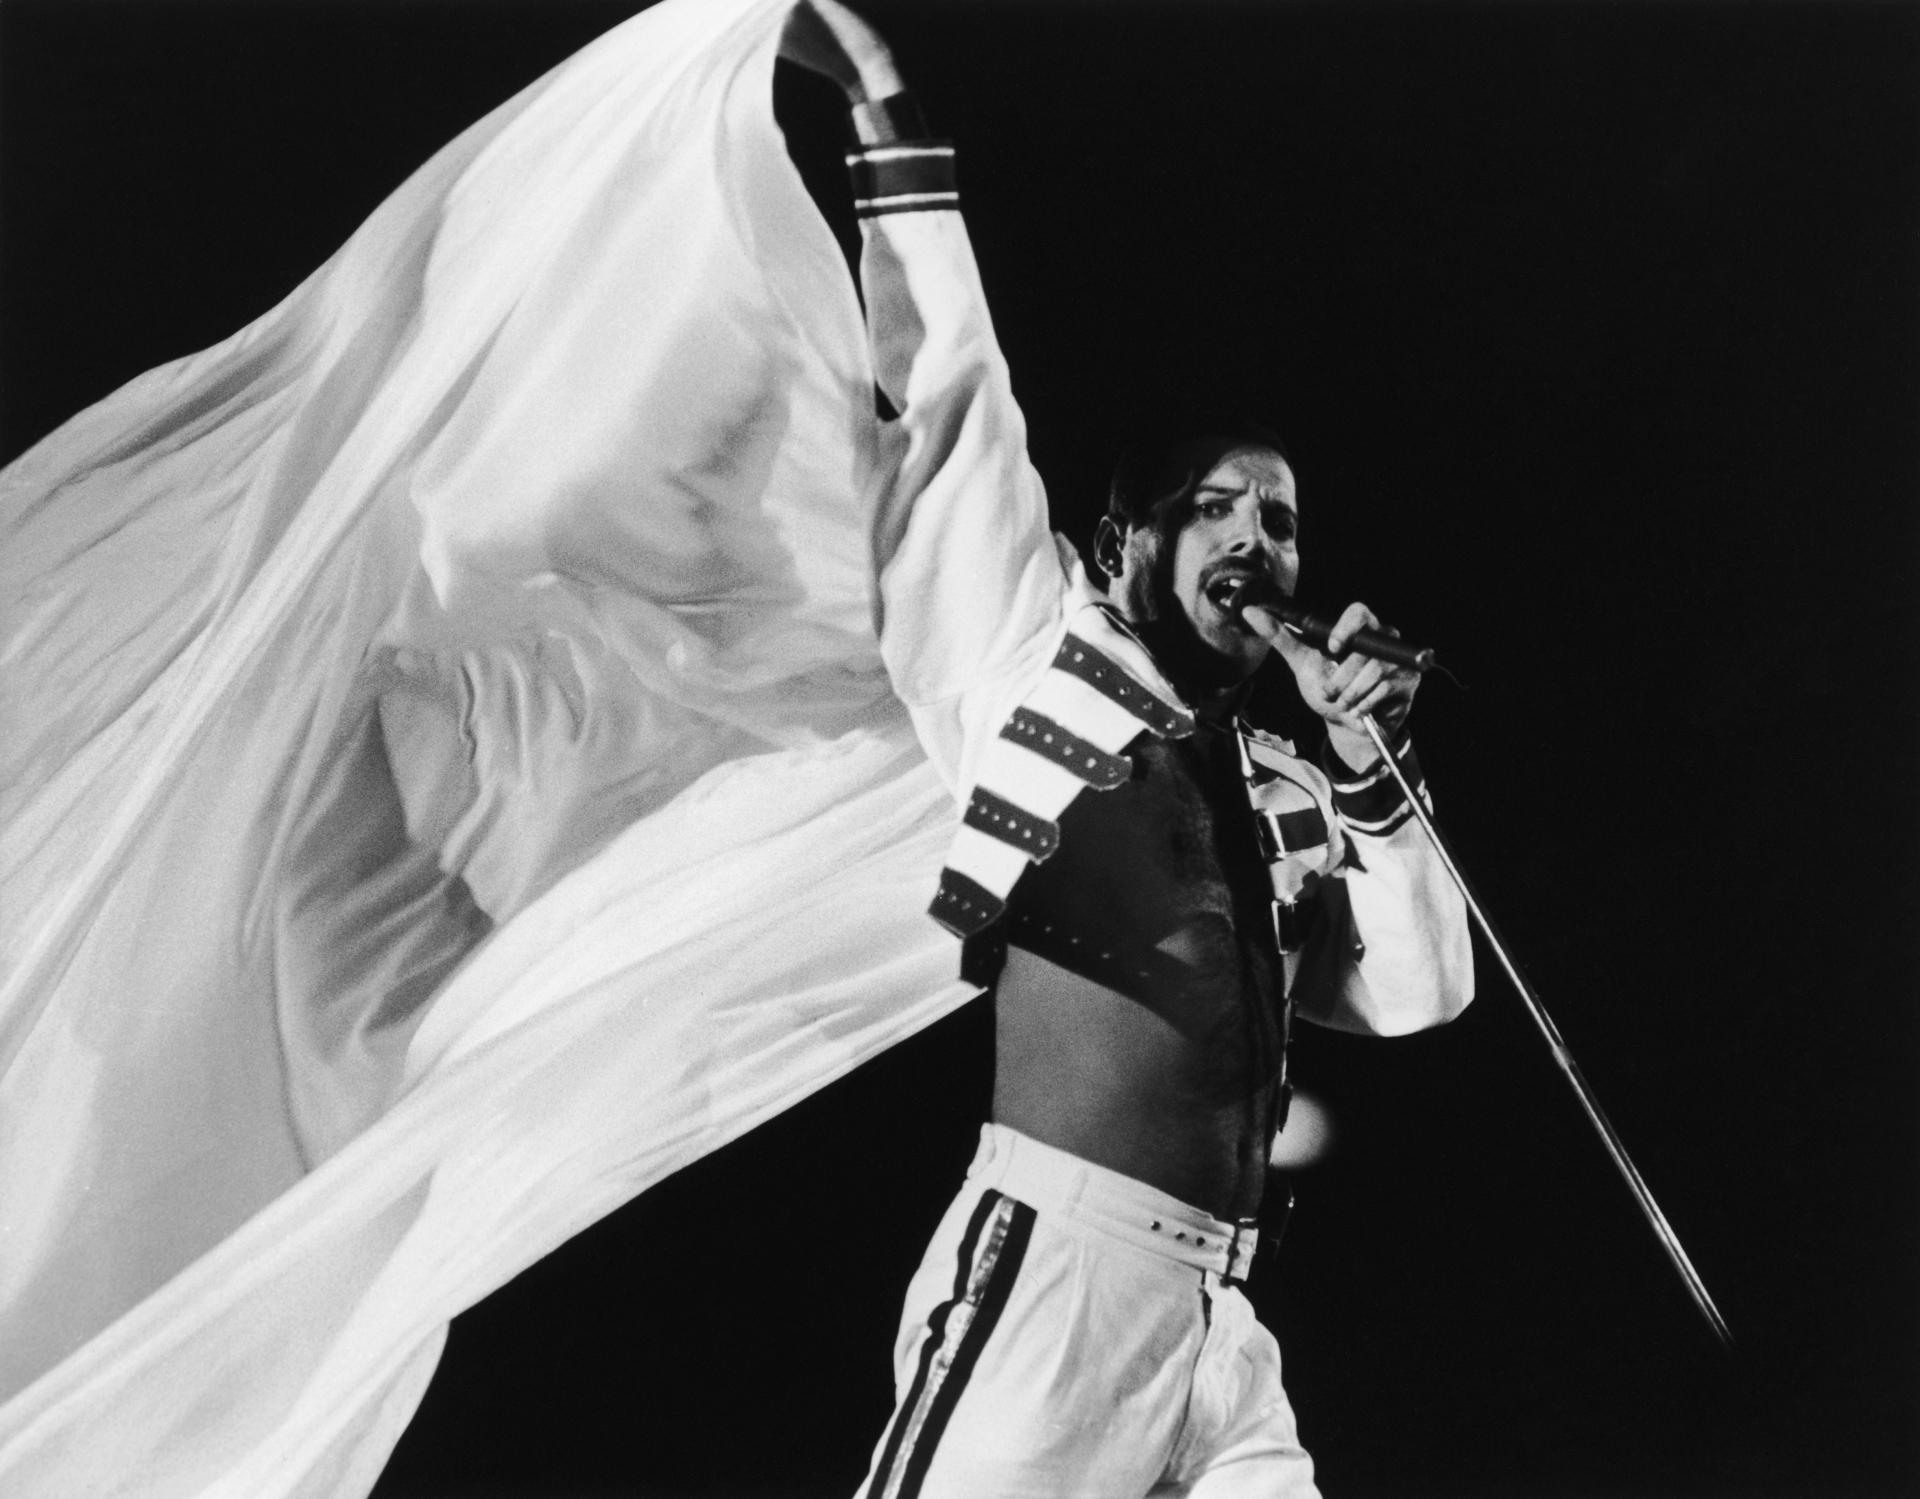 Freddie Mercury Wallpaper Hd Download